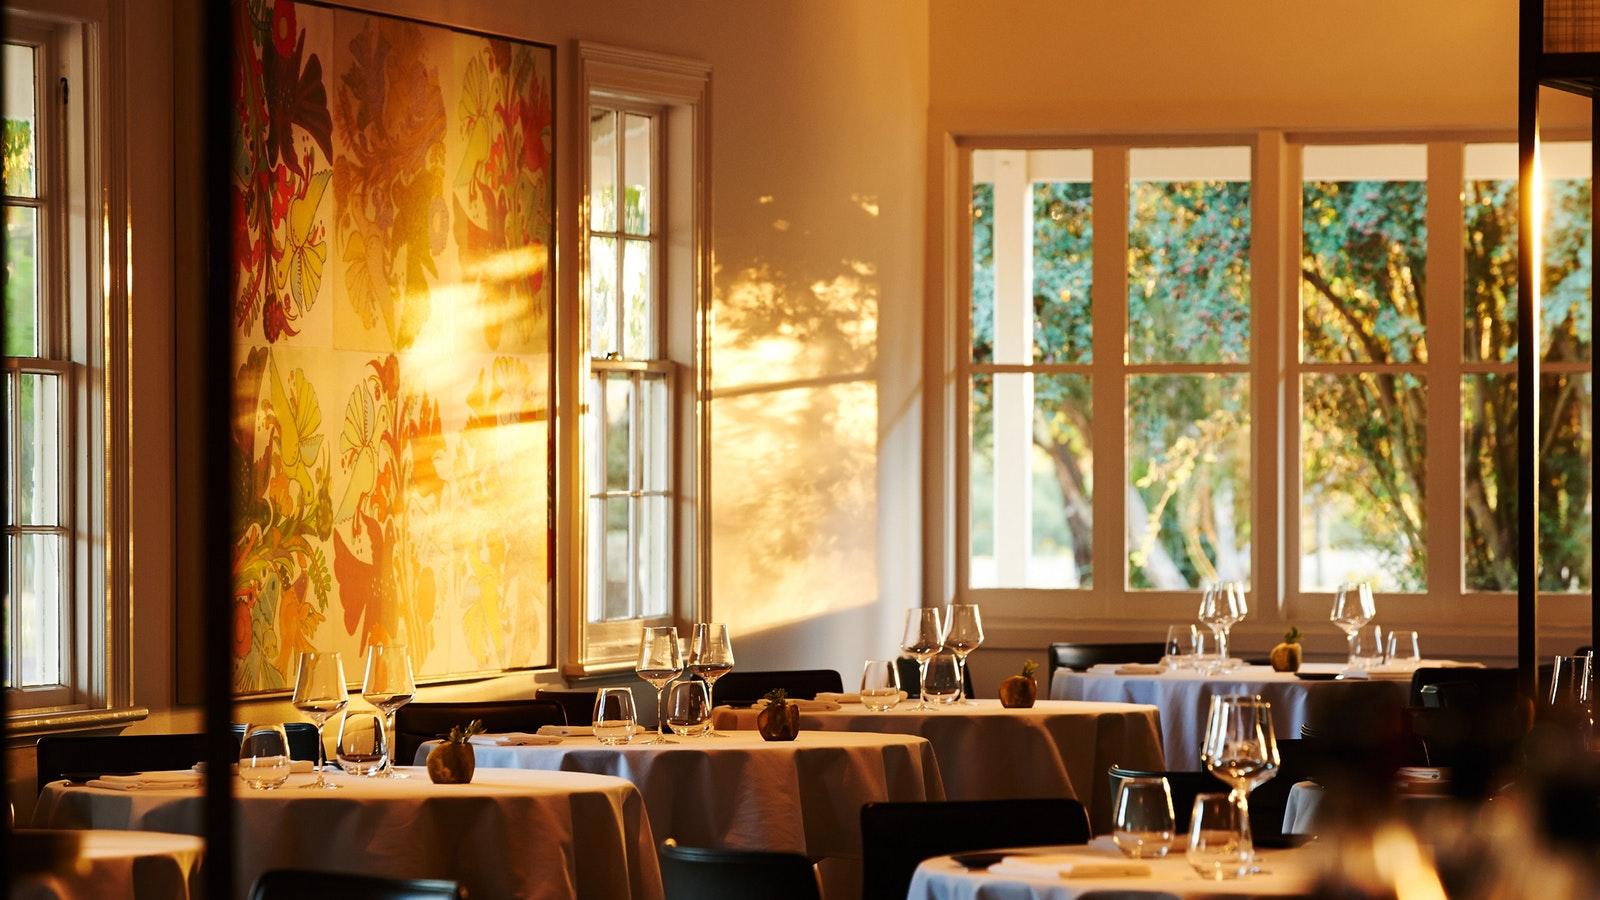 Brae dining room